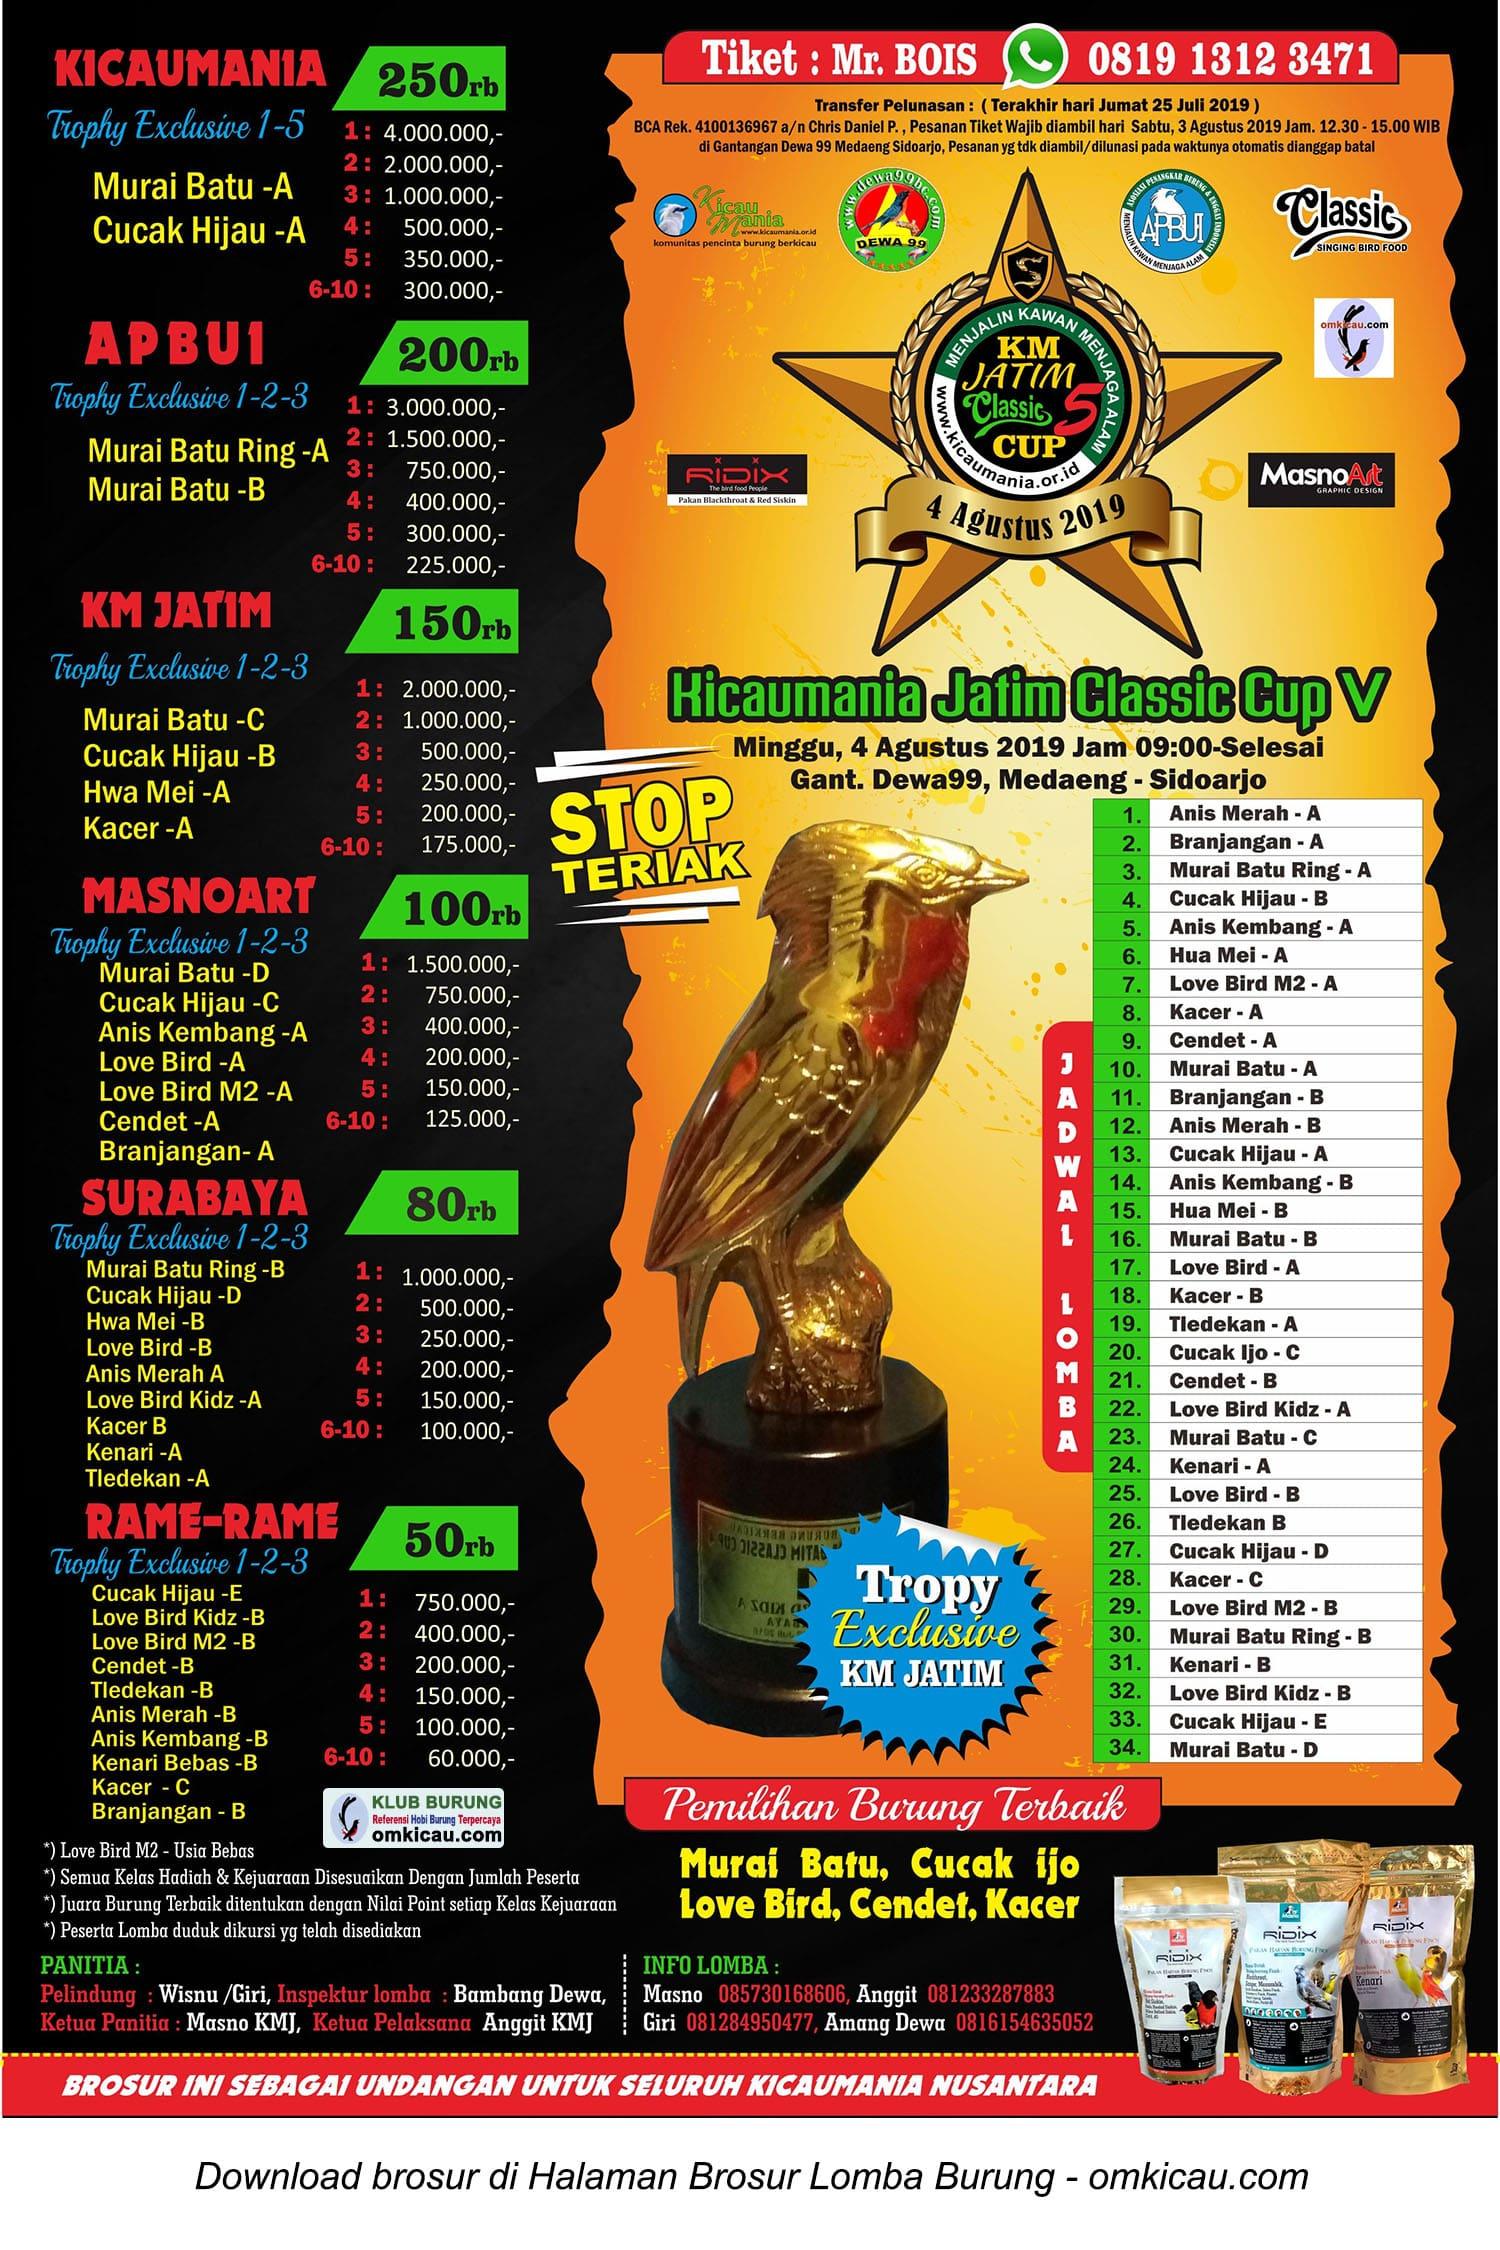 Kicaumania Jatim Classic Cup V